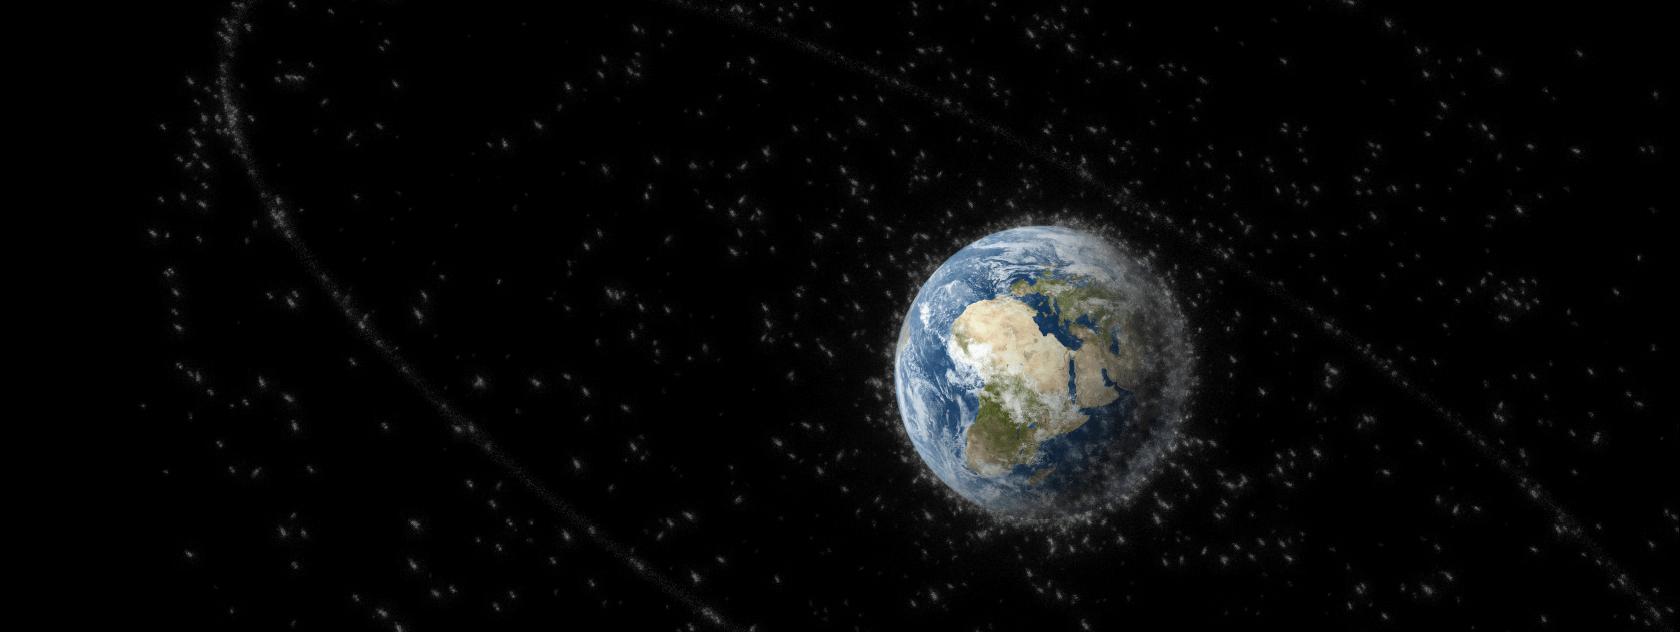 Space_debris